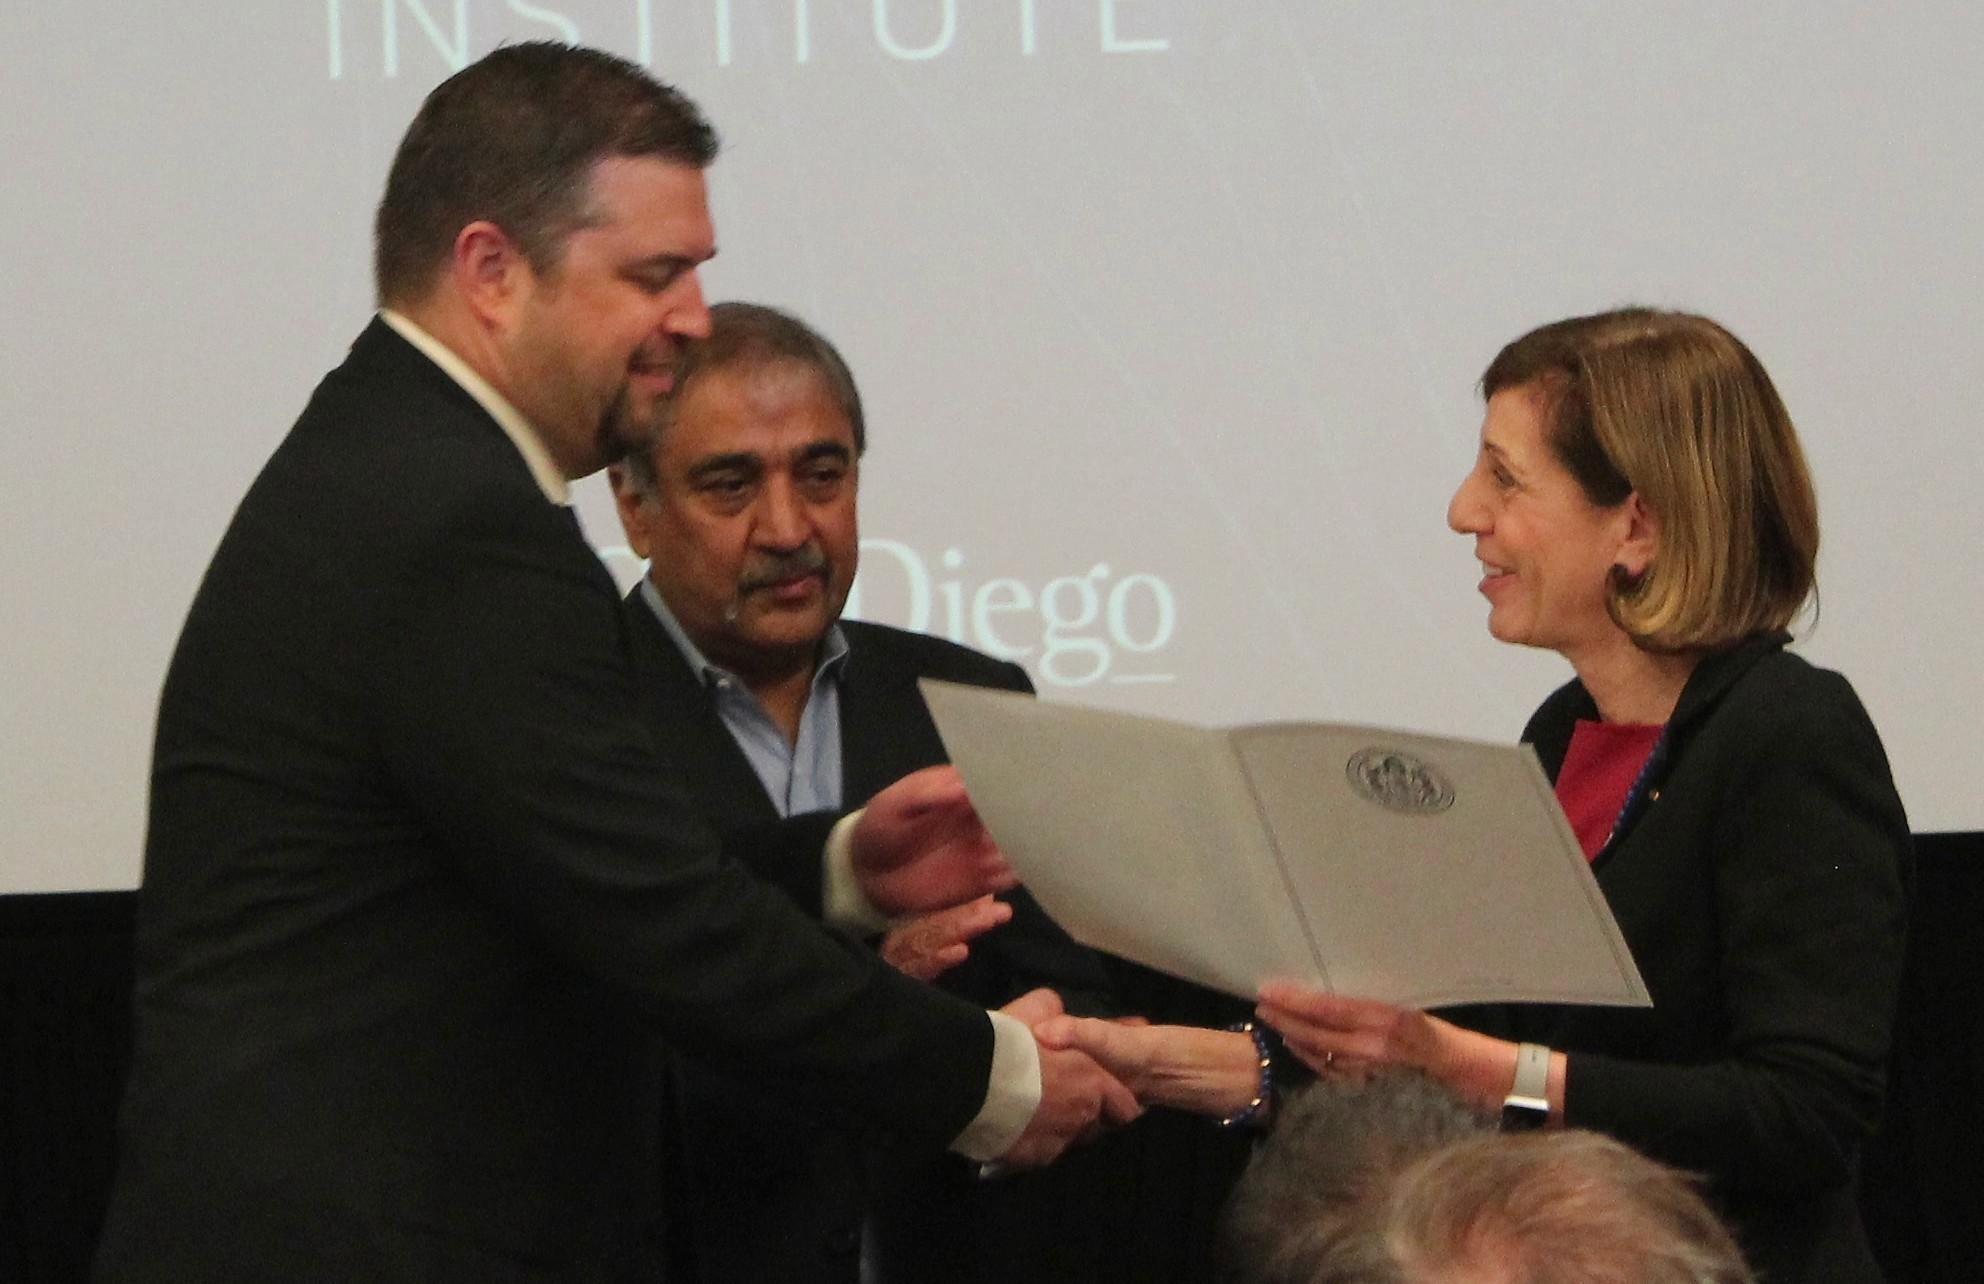 Taner Halicioğlu, Pradeep Khosla, Barbara Bry